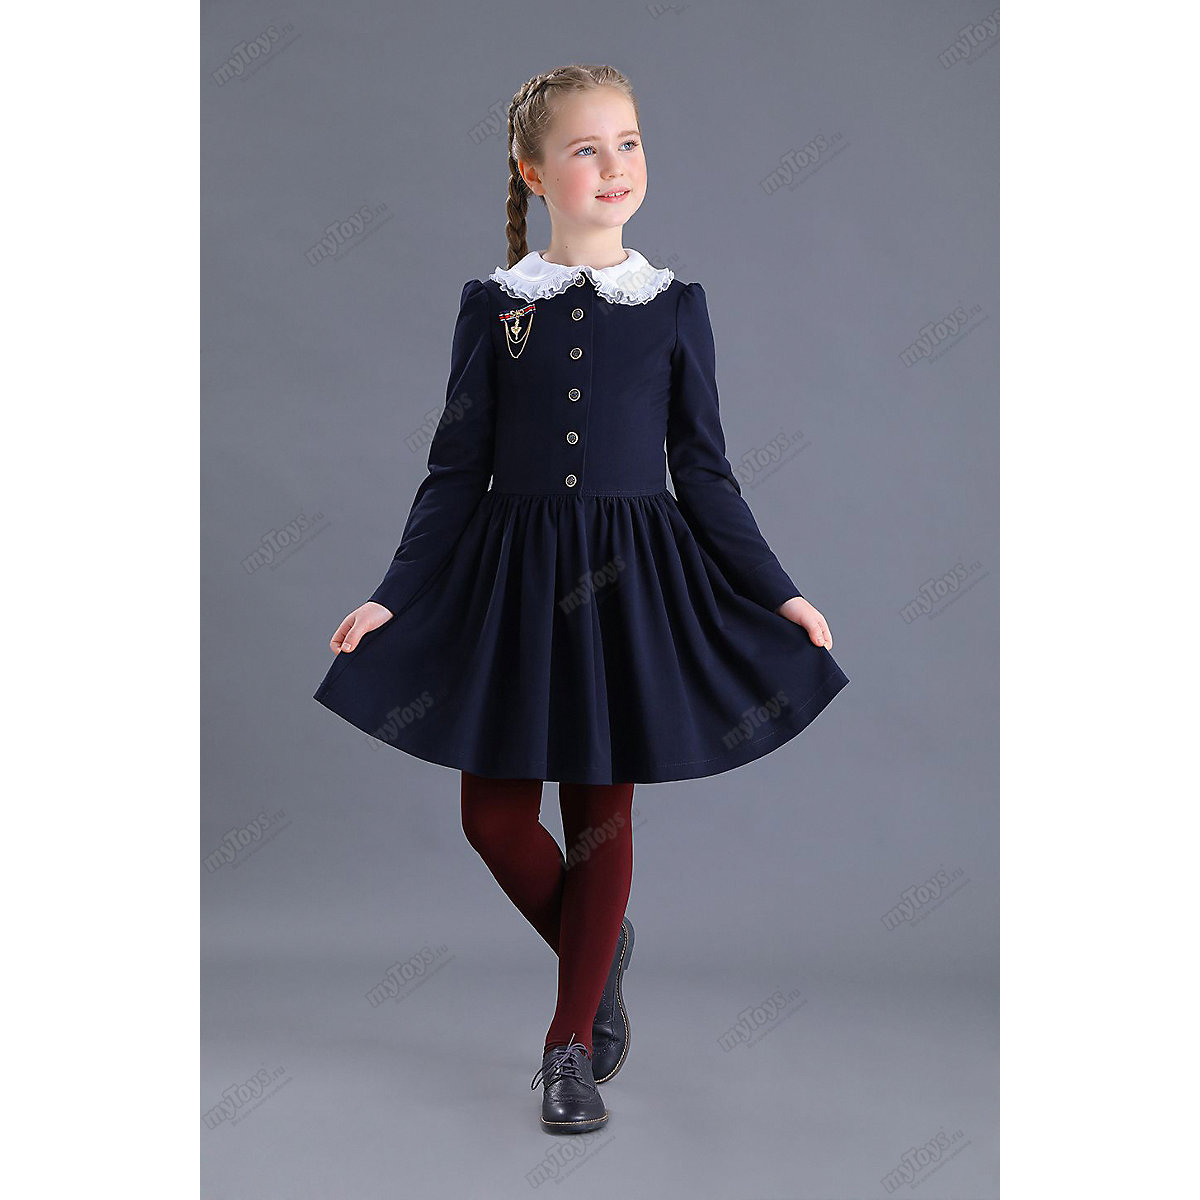 Malenkaya Lady Dresses 11685654 school uniform dark blue for girls [wamami] 300 gril school uniform suit 1 3 sd bjd dollfie